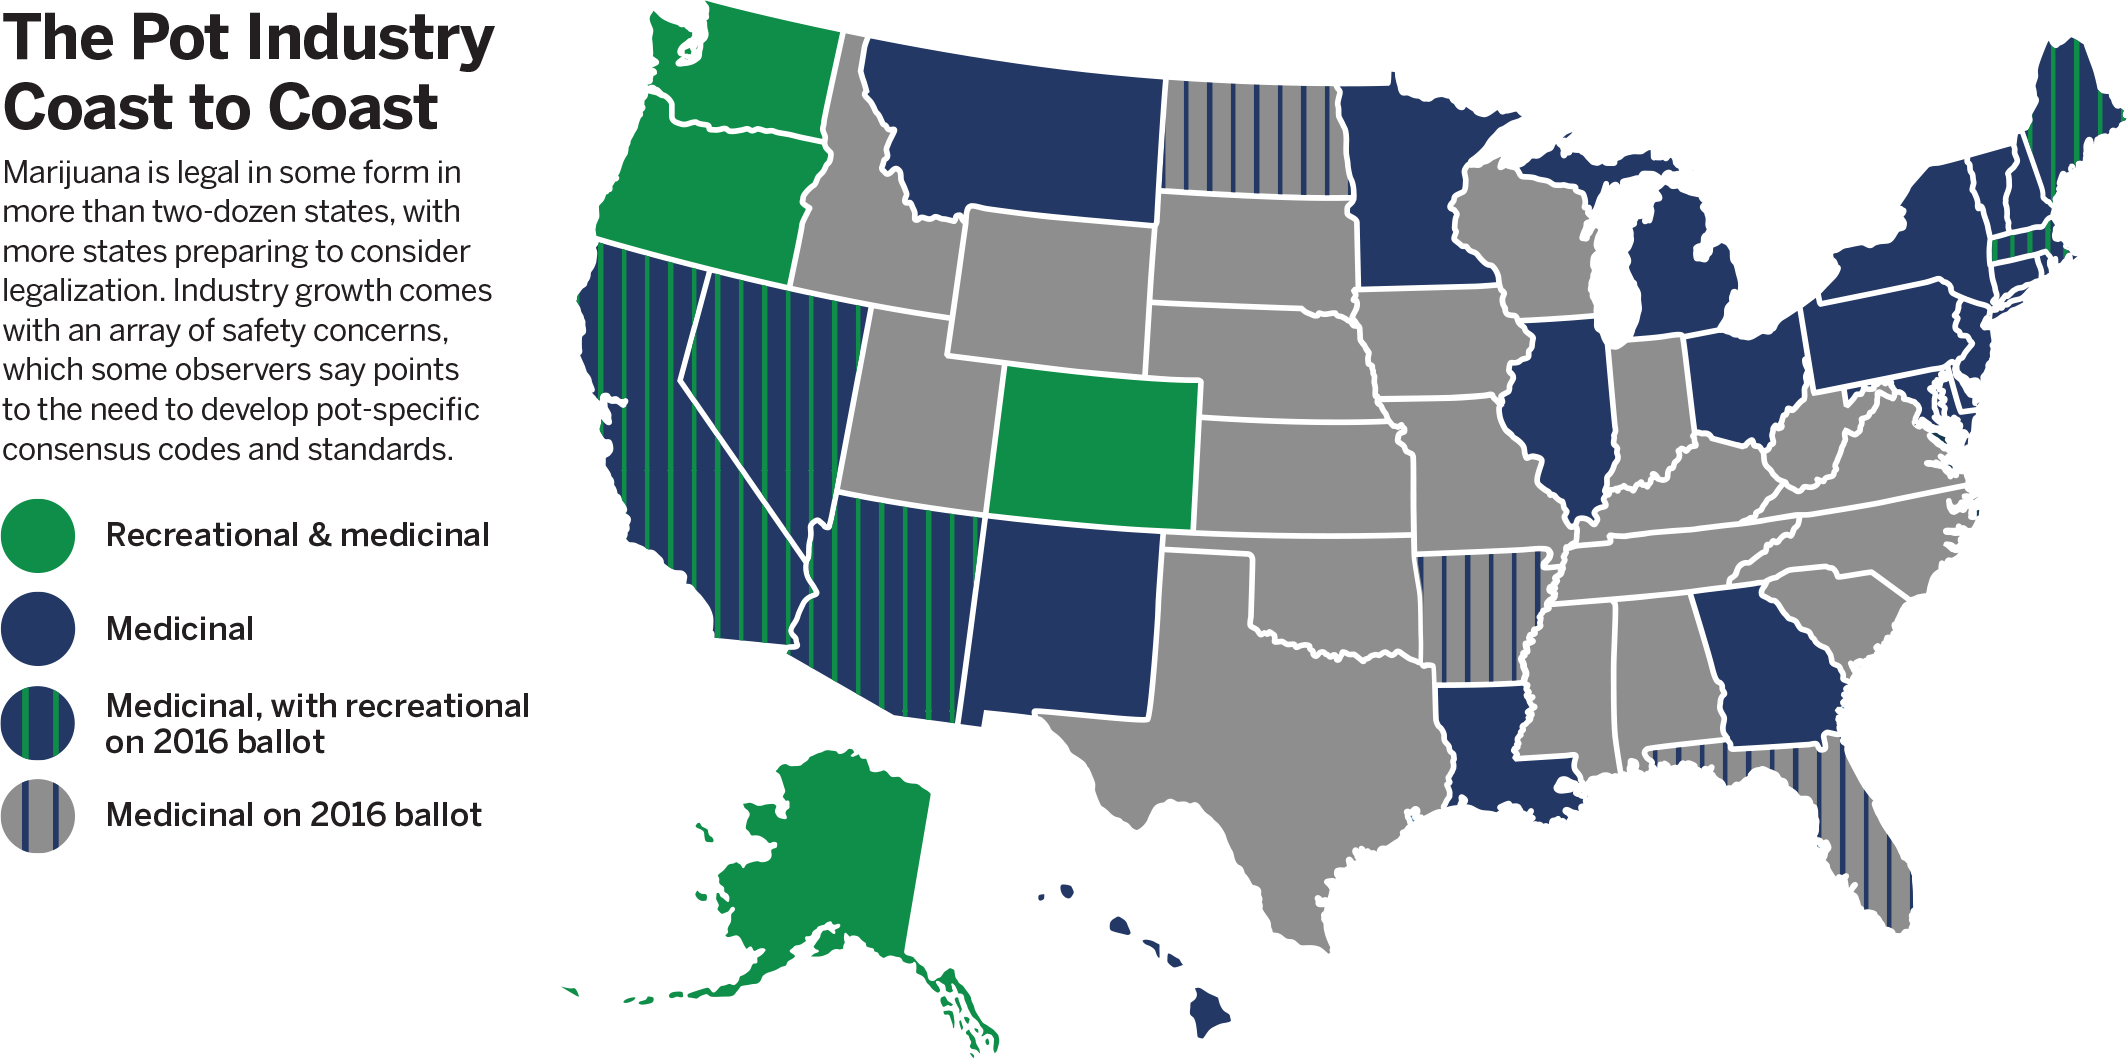 Map of united states current marjuana regulations